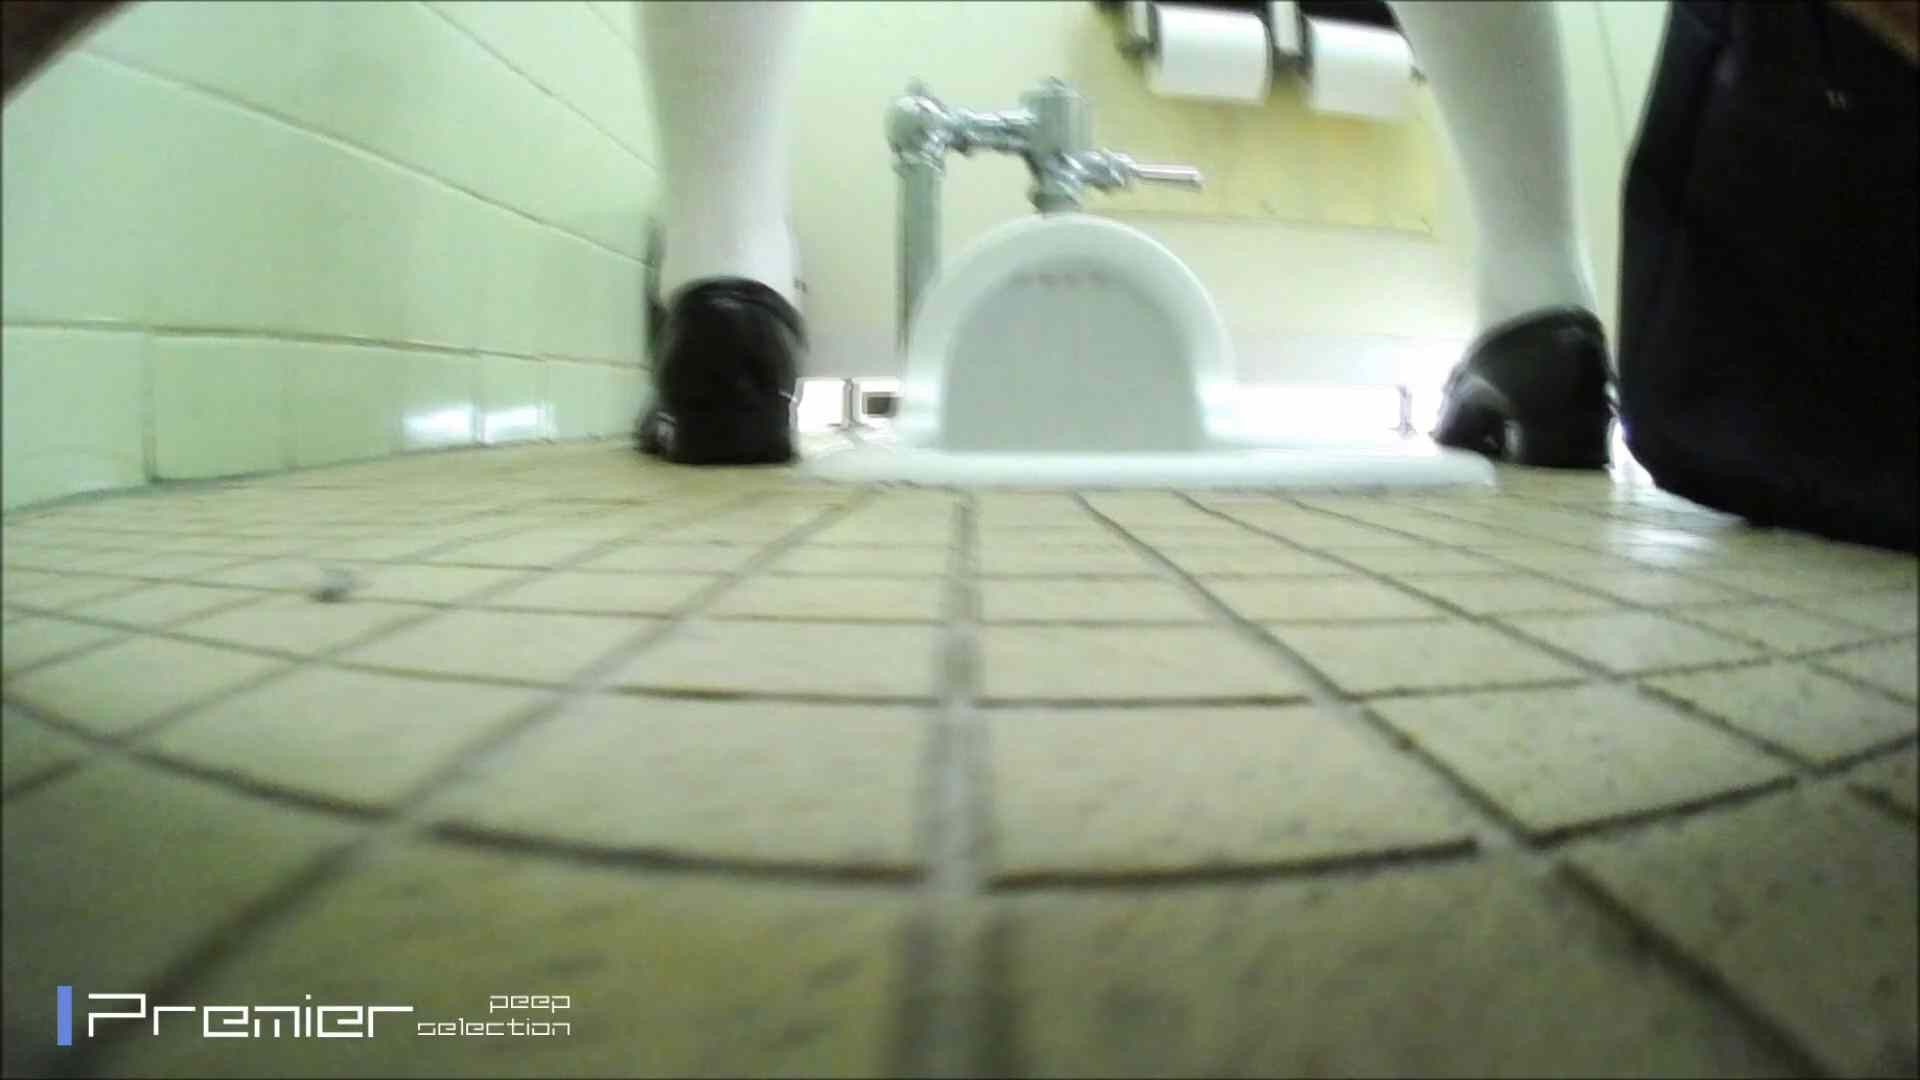 FHD激カワ!激やば! 復讐のトイレ盗撮 Vol.03 名作殿堂  78PIX 18